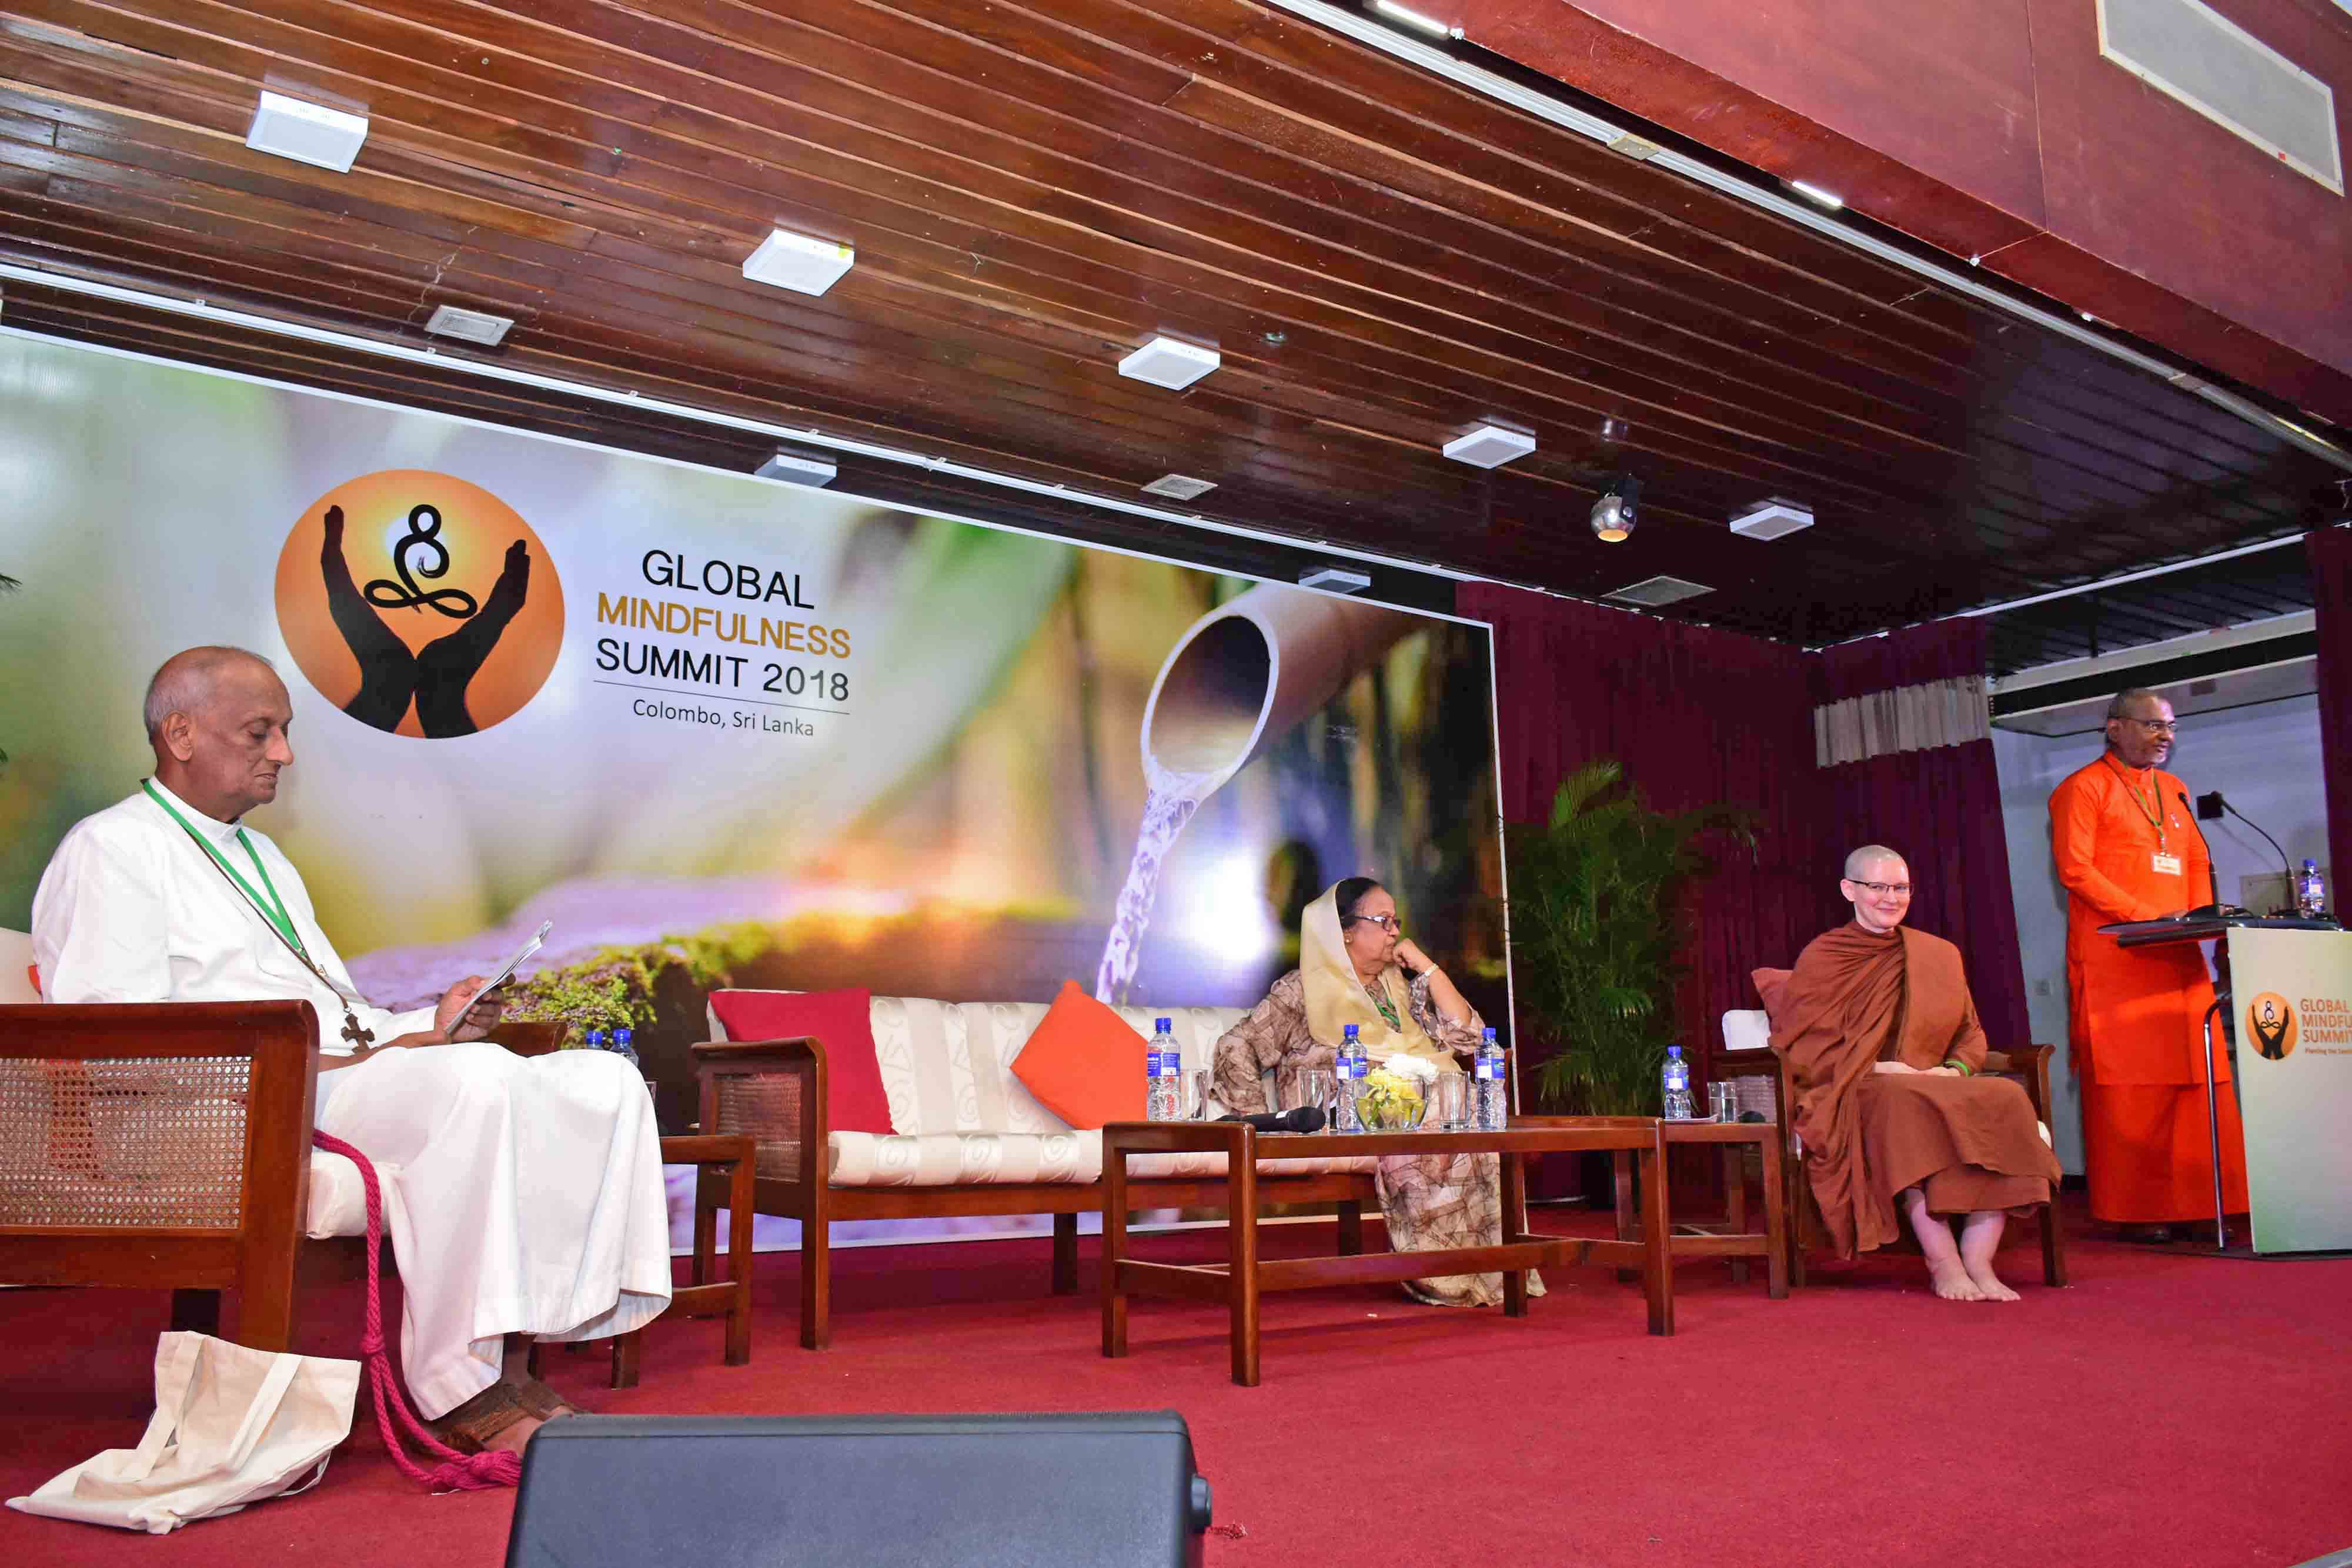 Global Mindfulness Summit 2018 - Day2 (77)